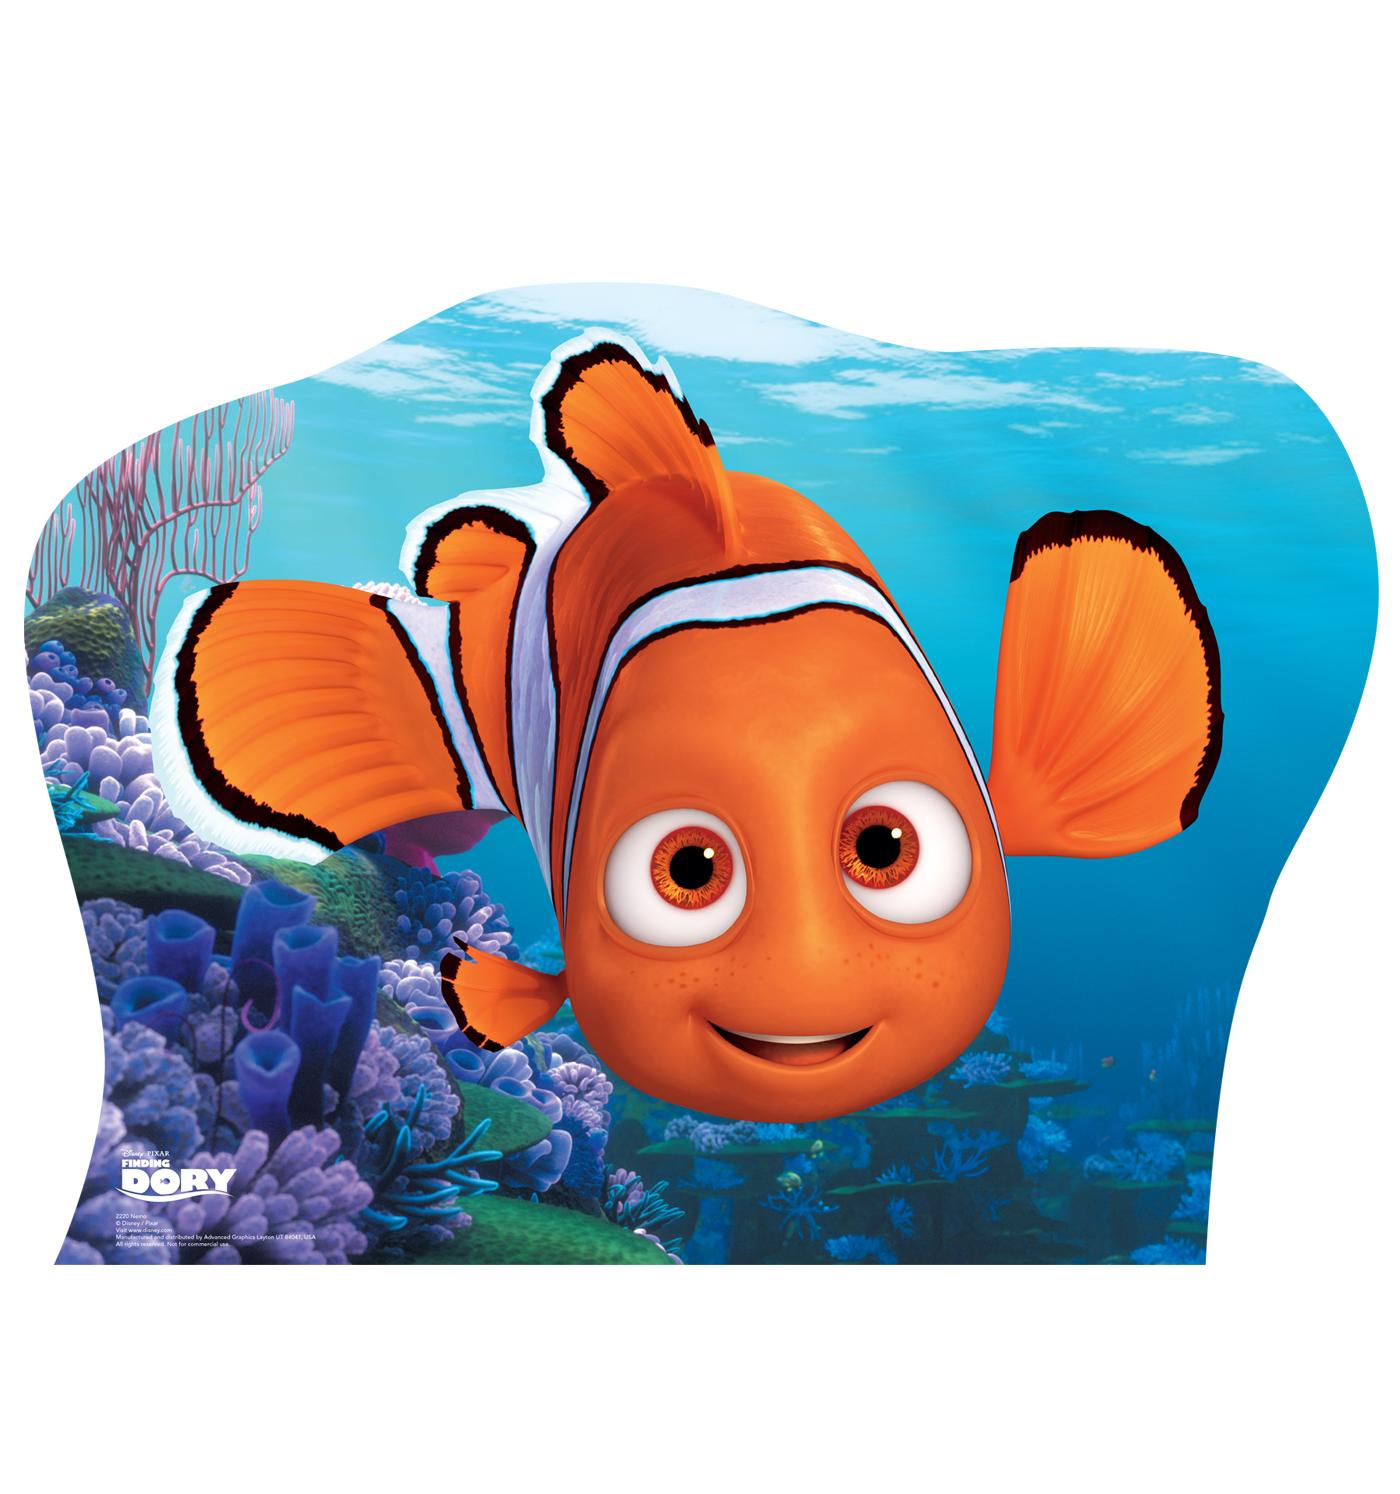 Finding dory nemo clown fish disney lifesize standup for Finding nemo fish